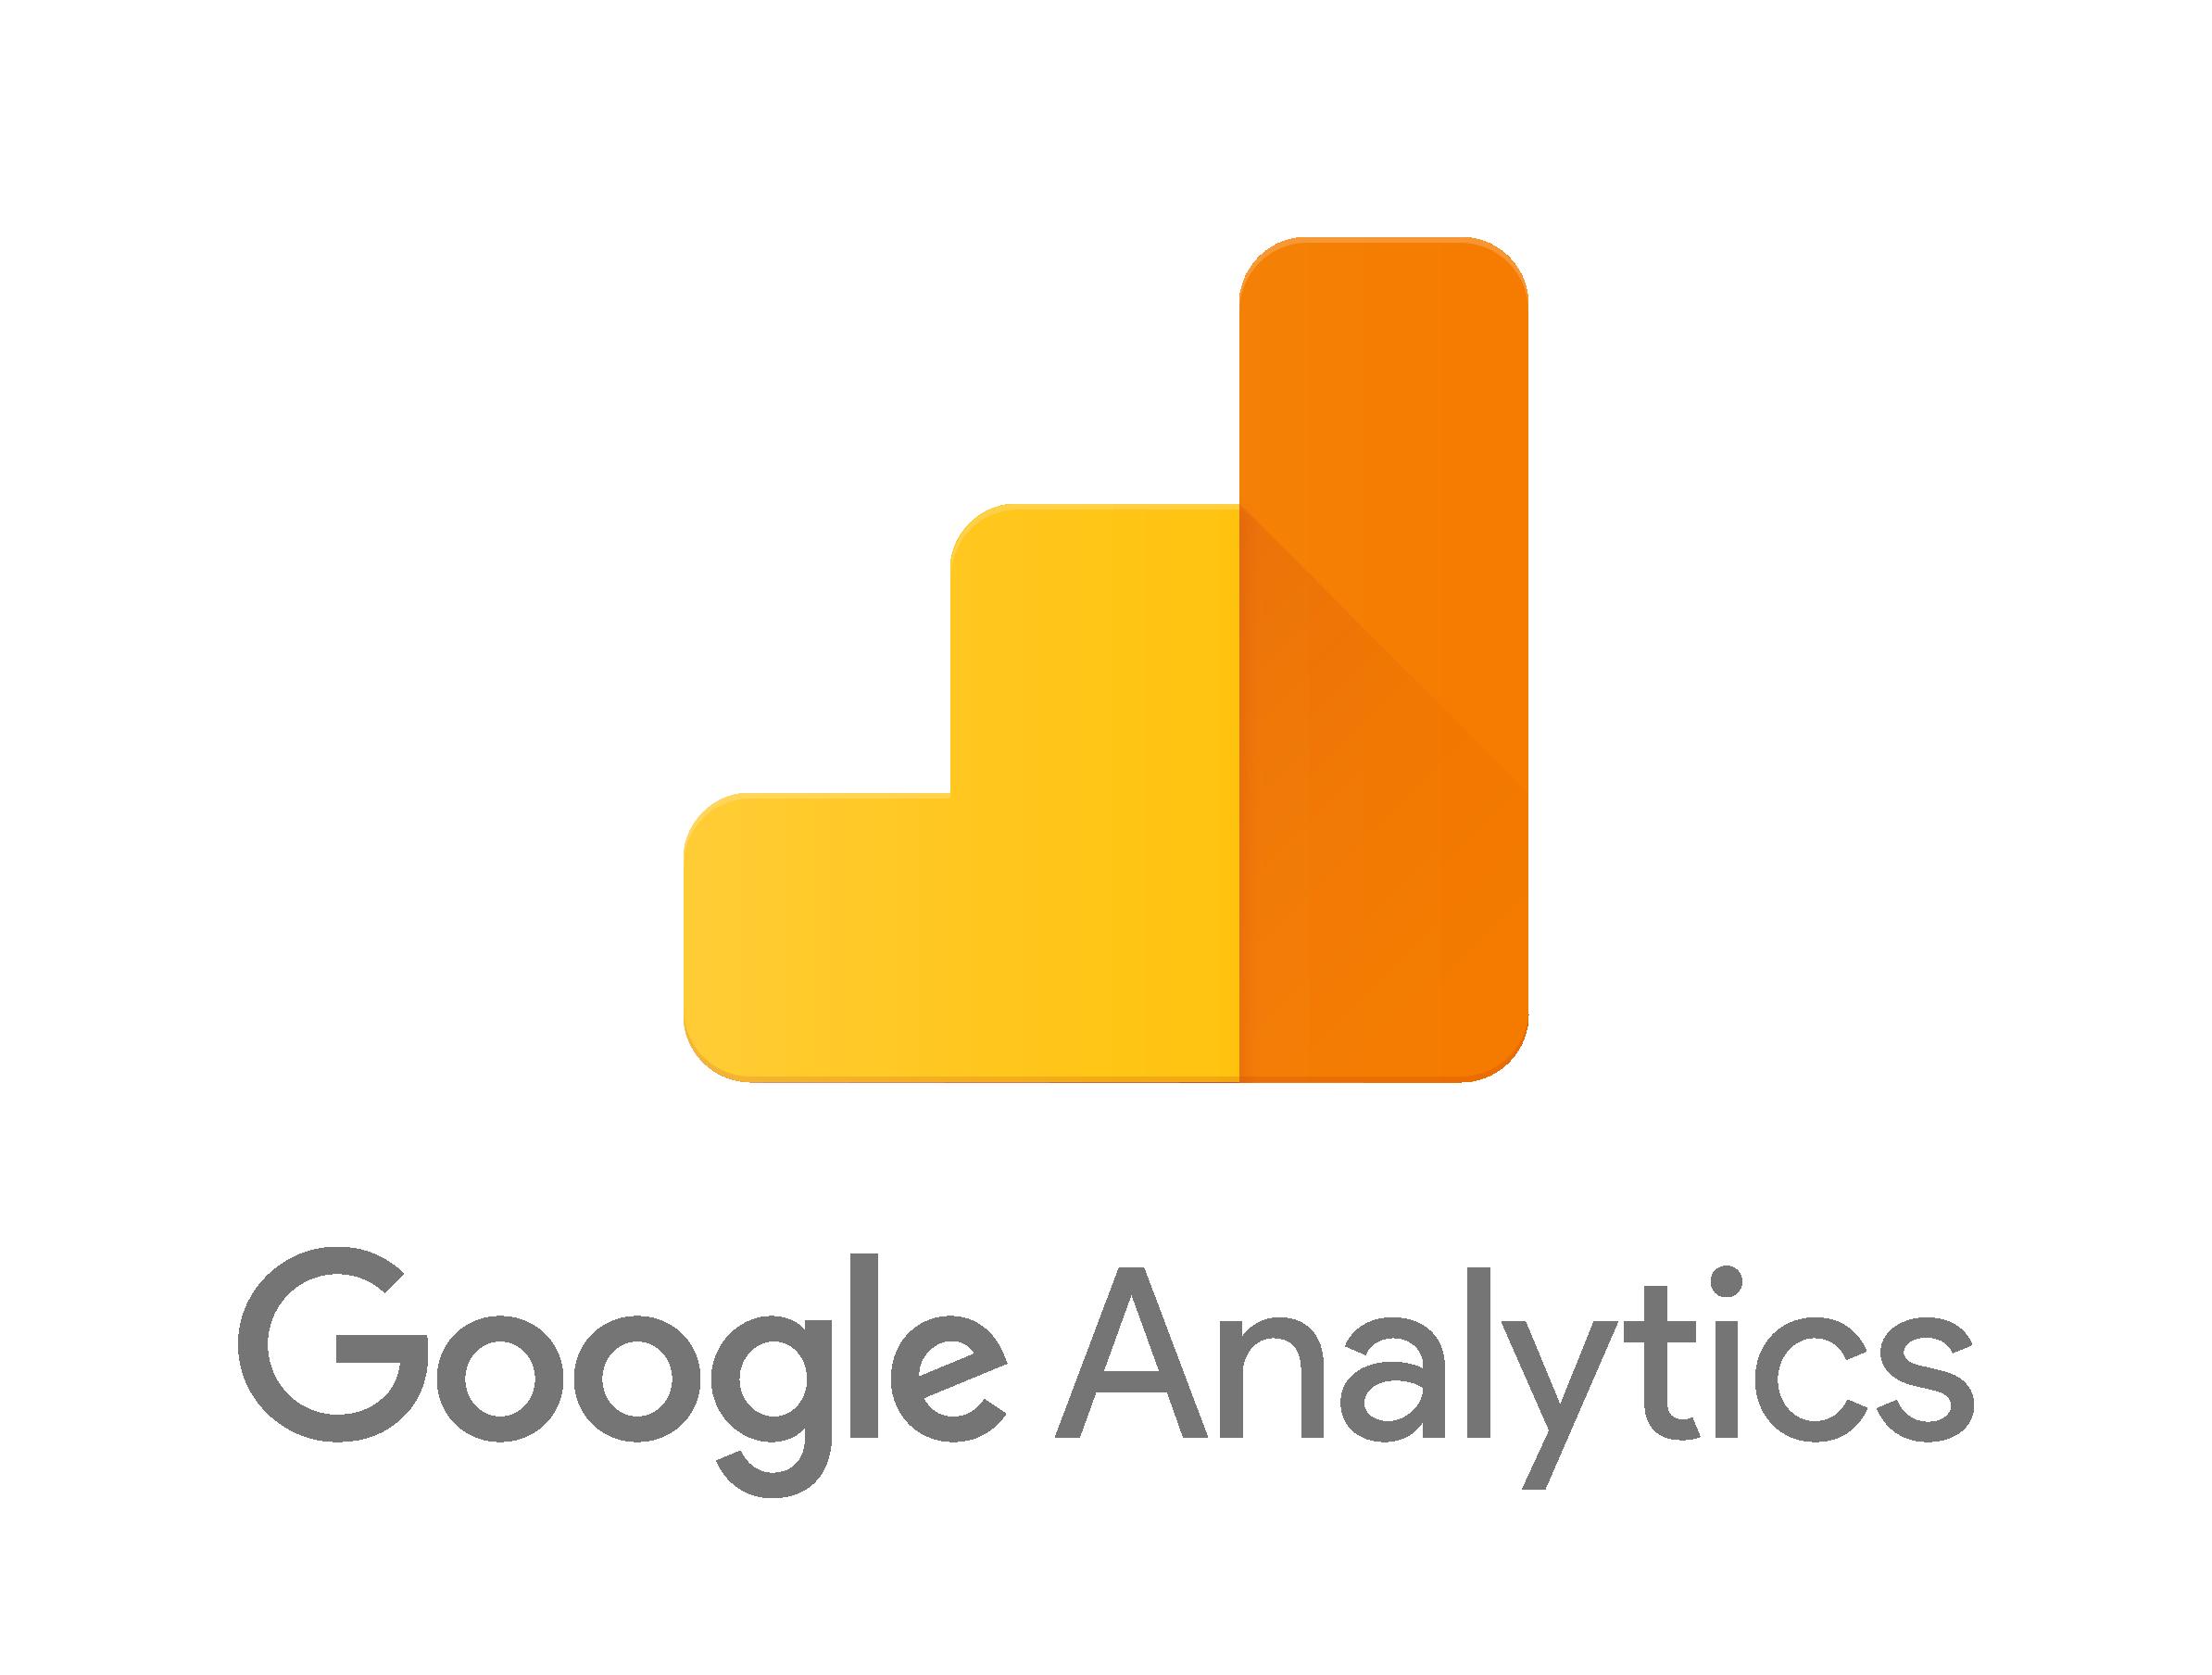 Google analytics png. Using to demonstrate roi